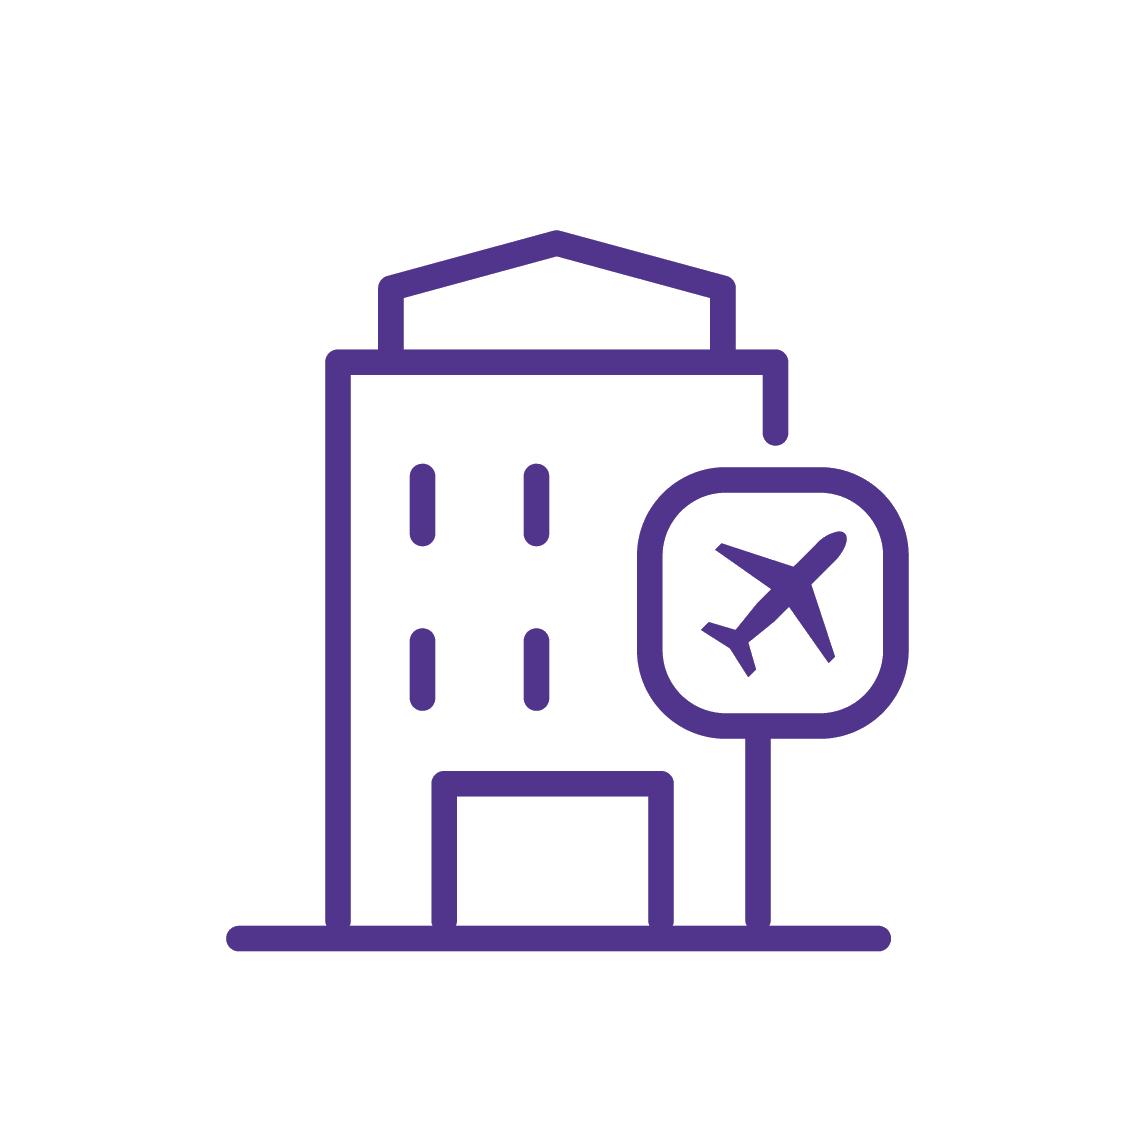 Flughafenhotel direkt am Terminal